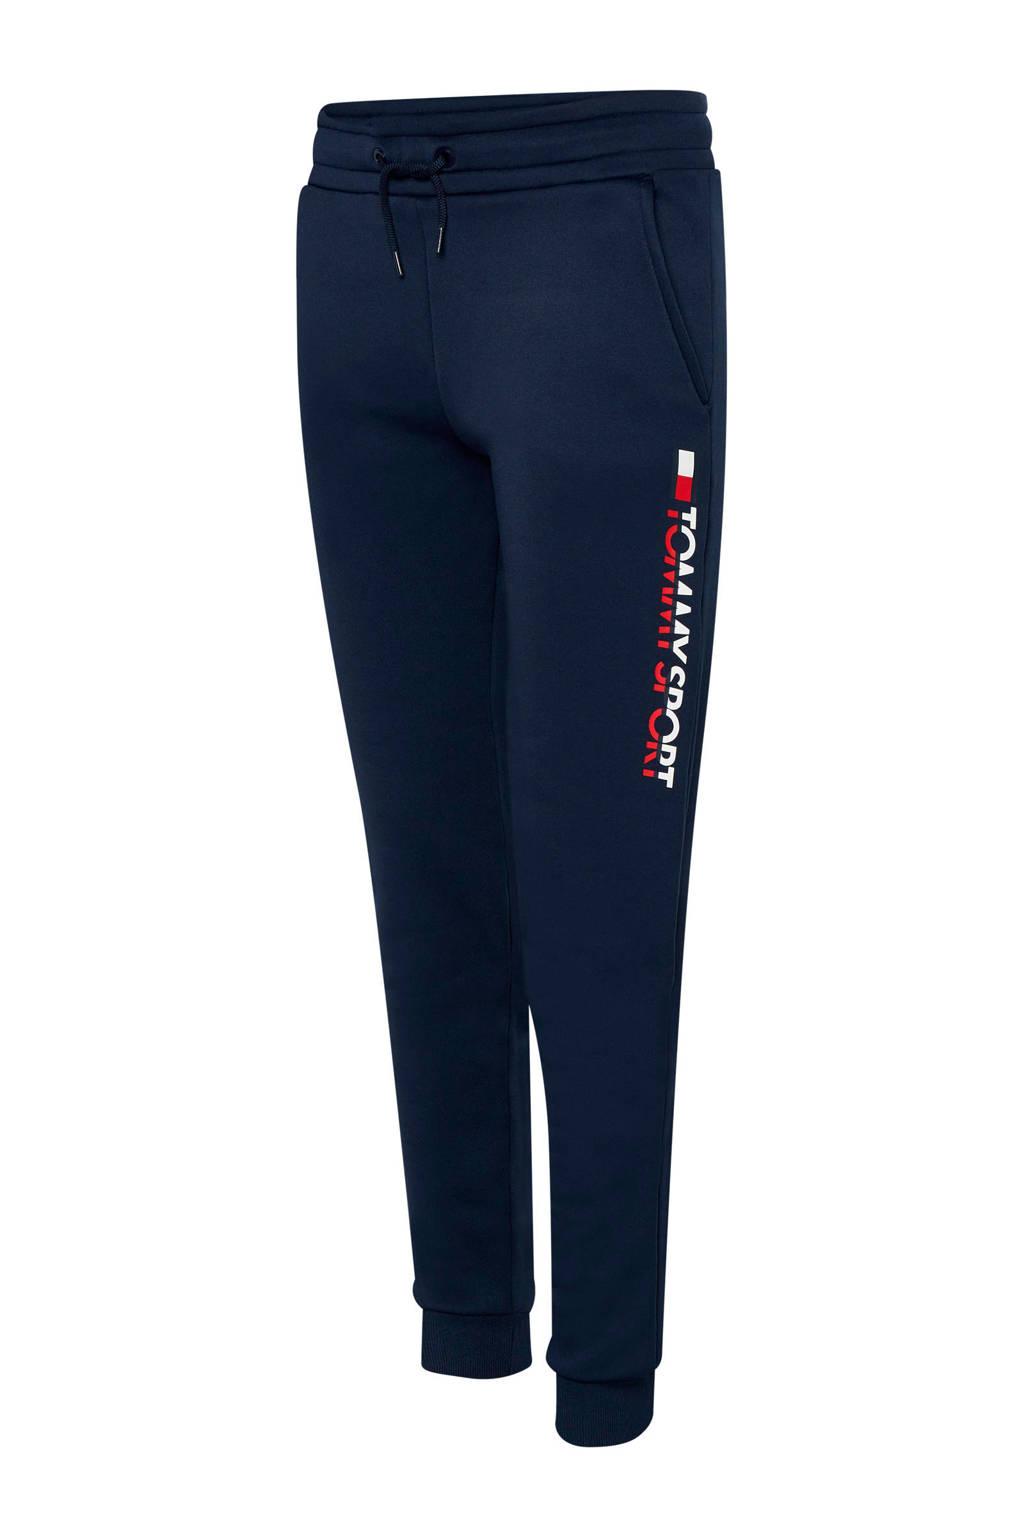 Tommy Hilfiger Sport joggingbroek donkerblauw, Donkerblauw